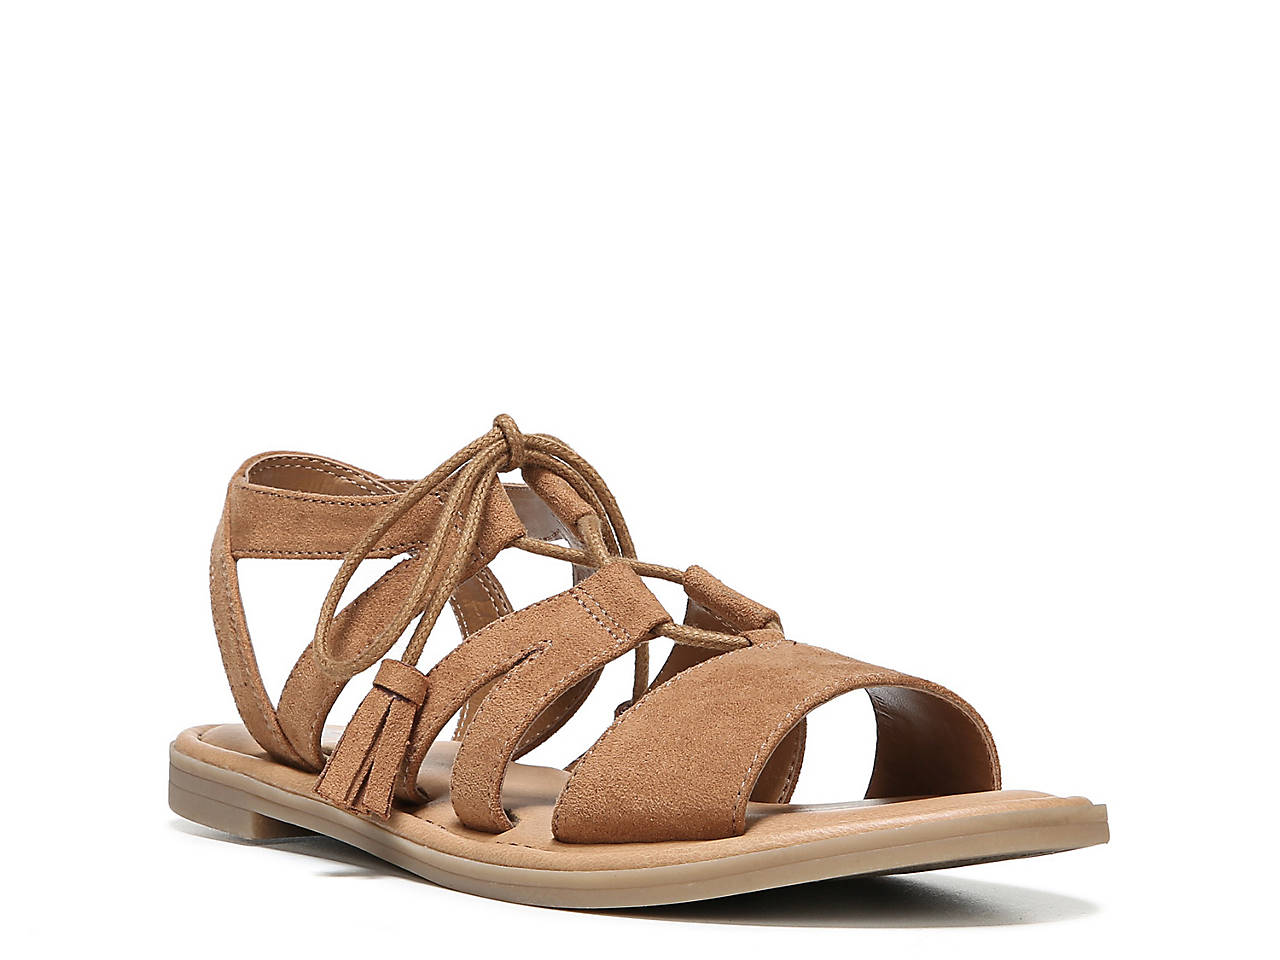 810c167a6046 Dr. Scholl s Encourage Gladiator Sandal Women s Shoes